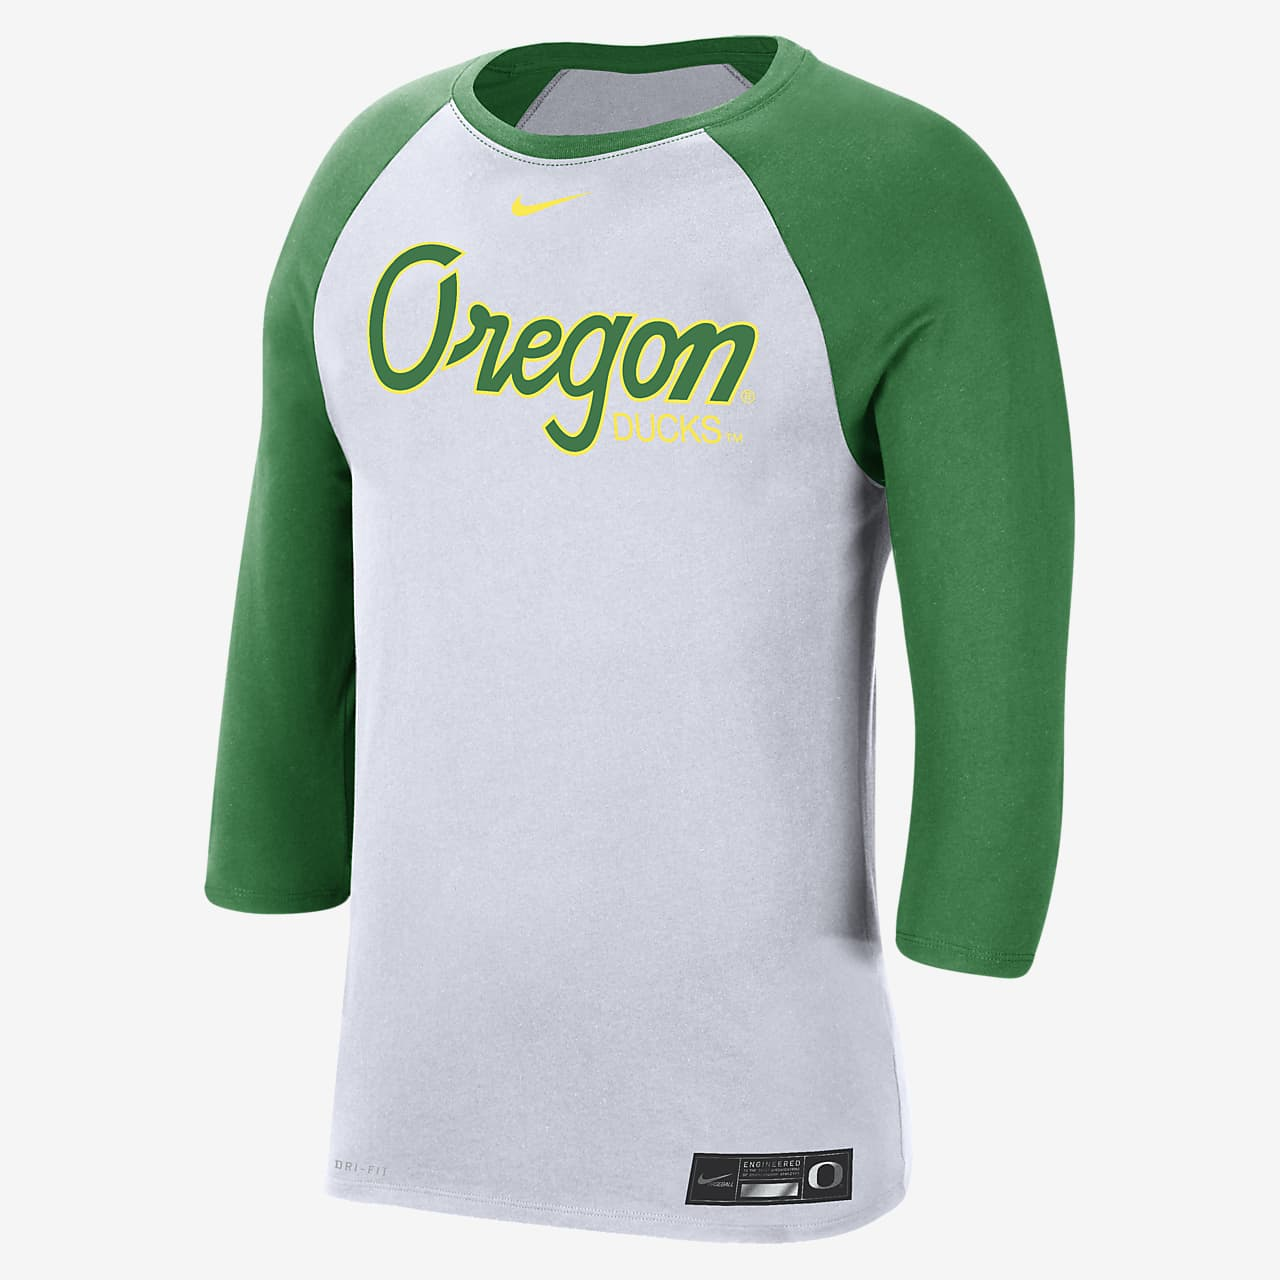 Nike College Dri-FIT (Oregon) Men's 3/4-Sleeve T-Shirt